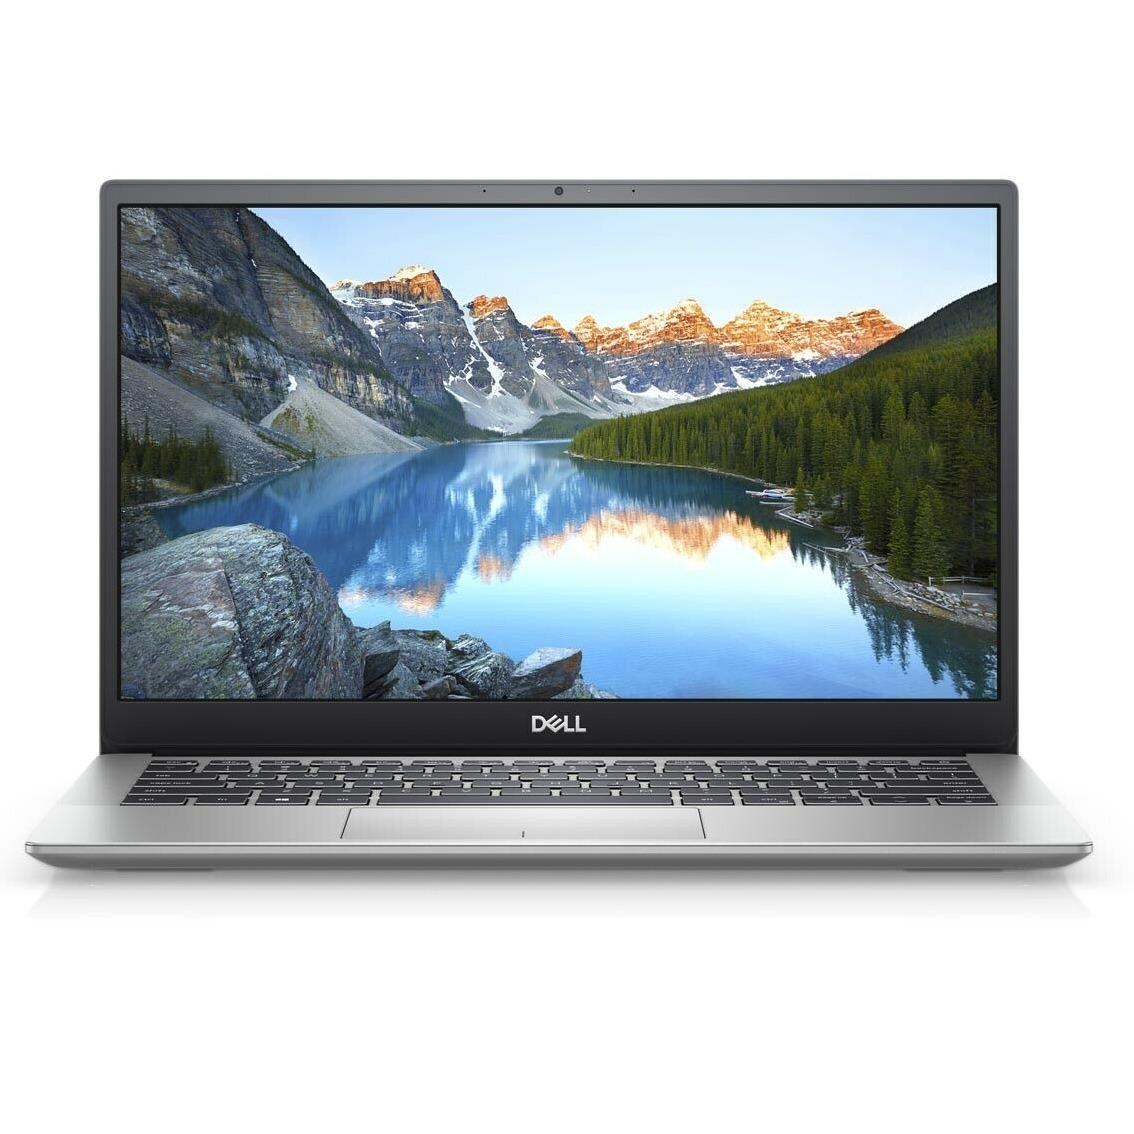 Dell 新款 Inspiron13 5390筆記本電腦限時熱賣